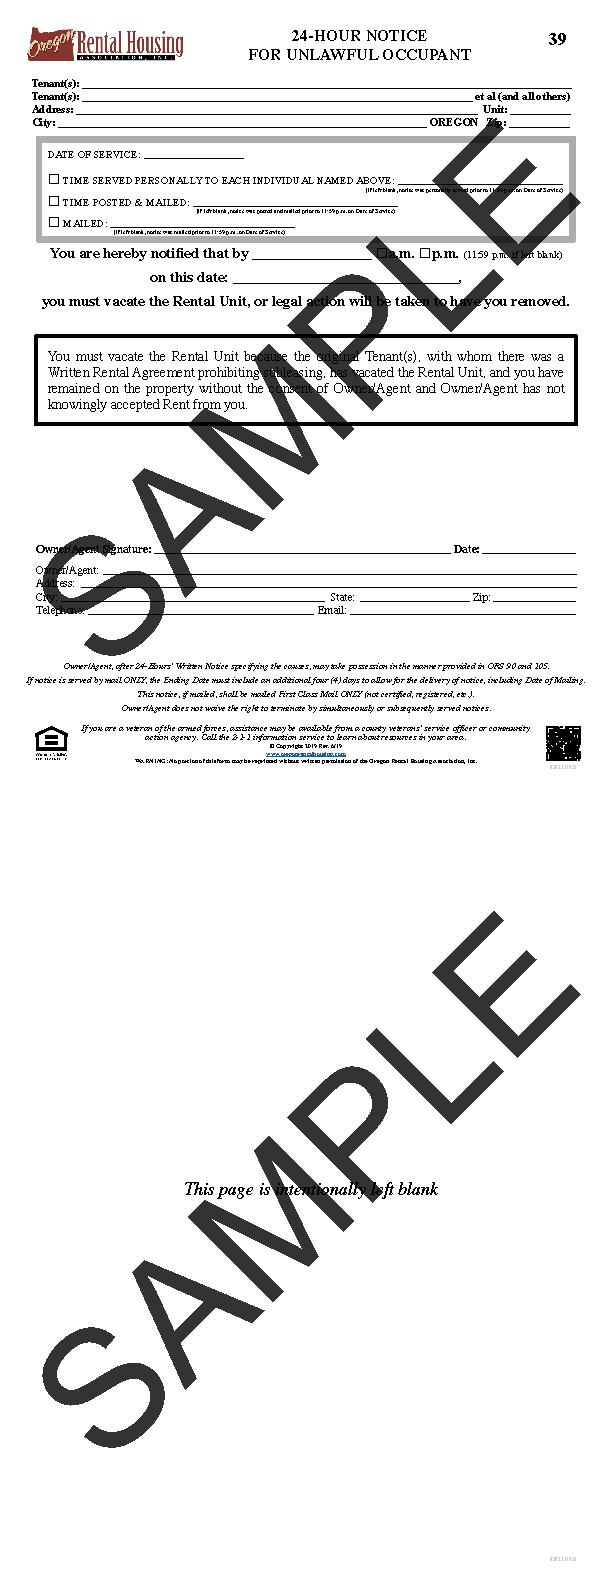 ORHA - Oregon Rental Housing Association - Online Forms Store